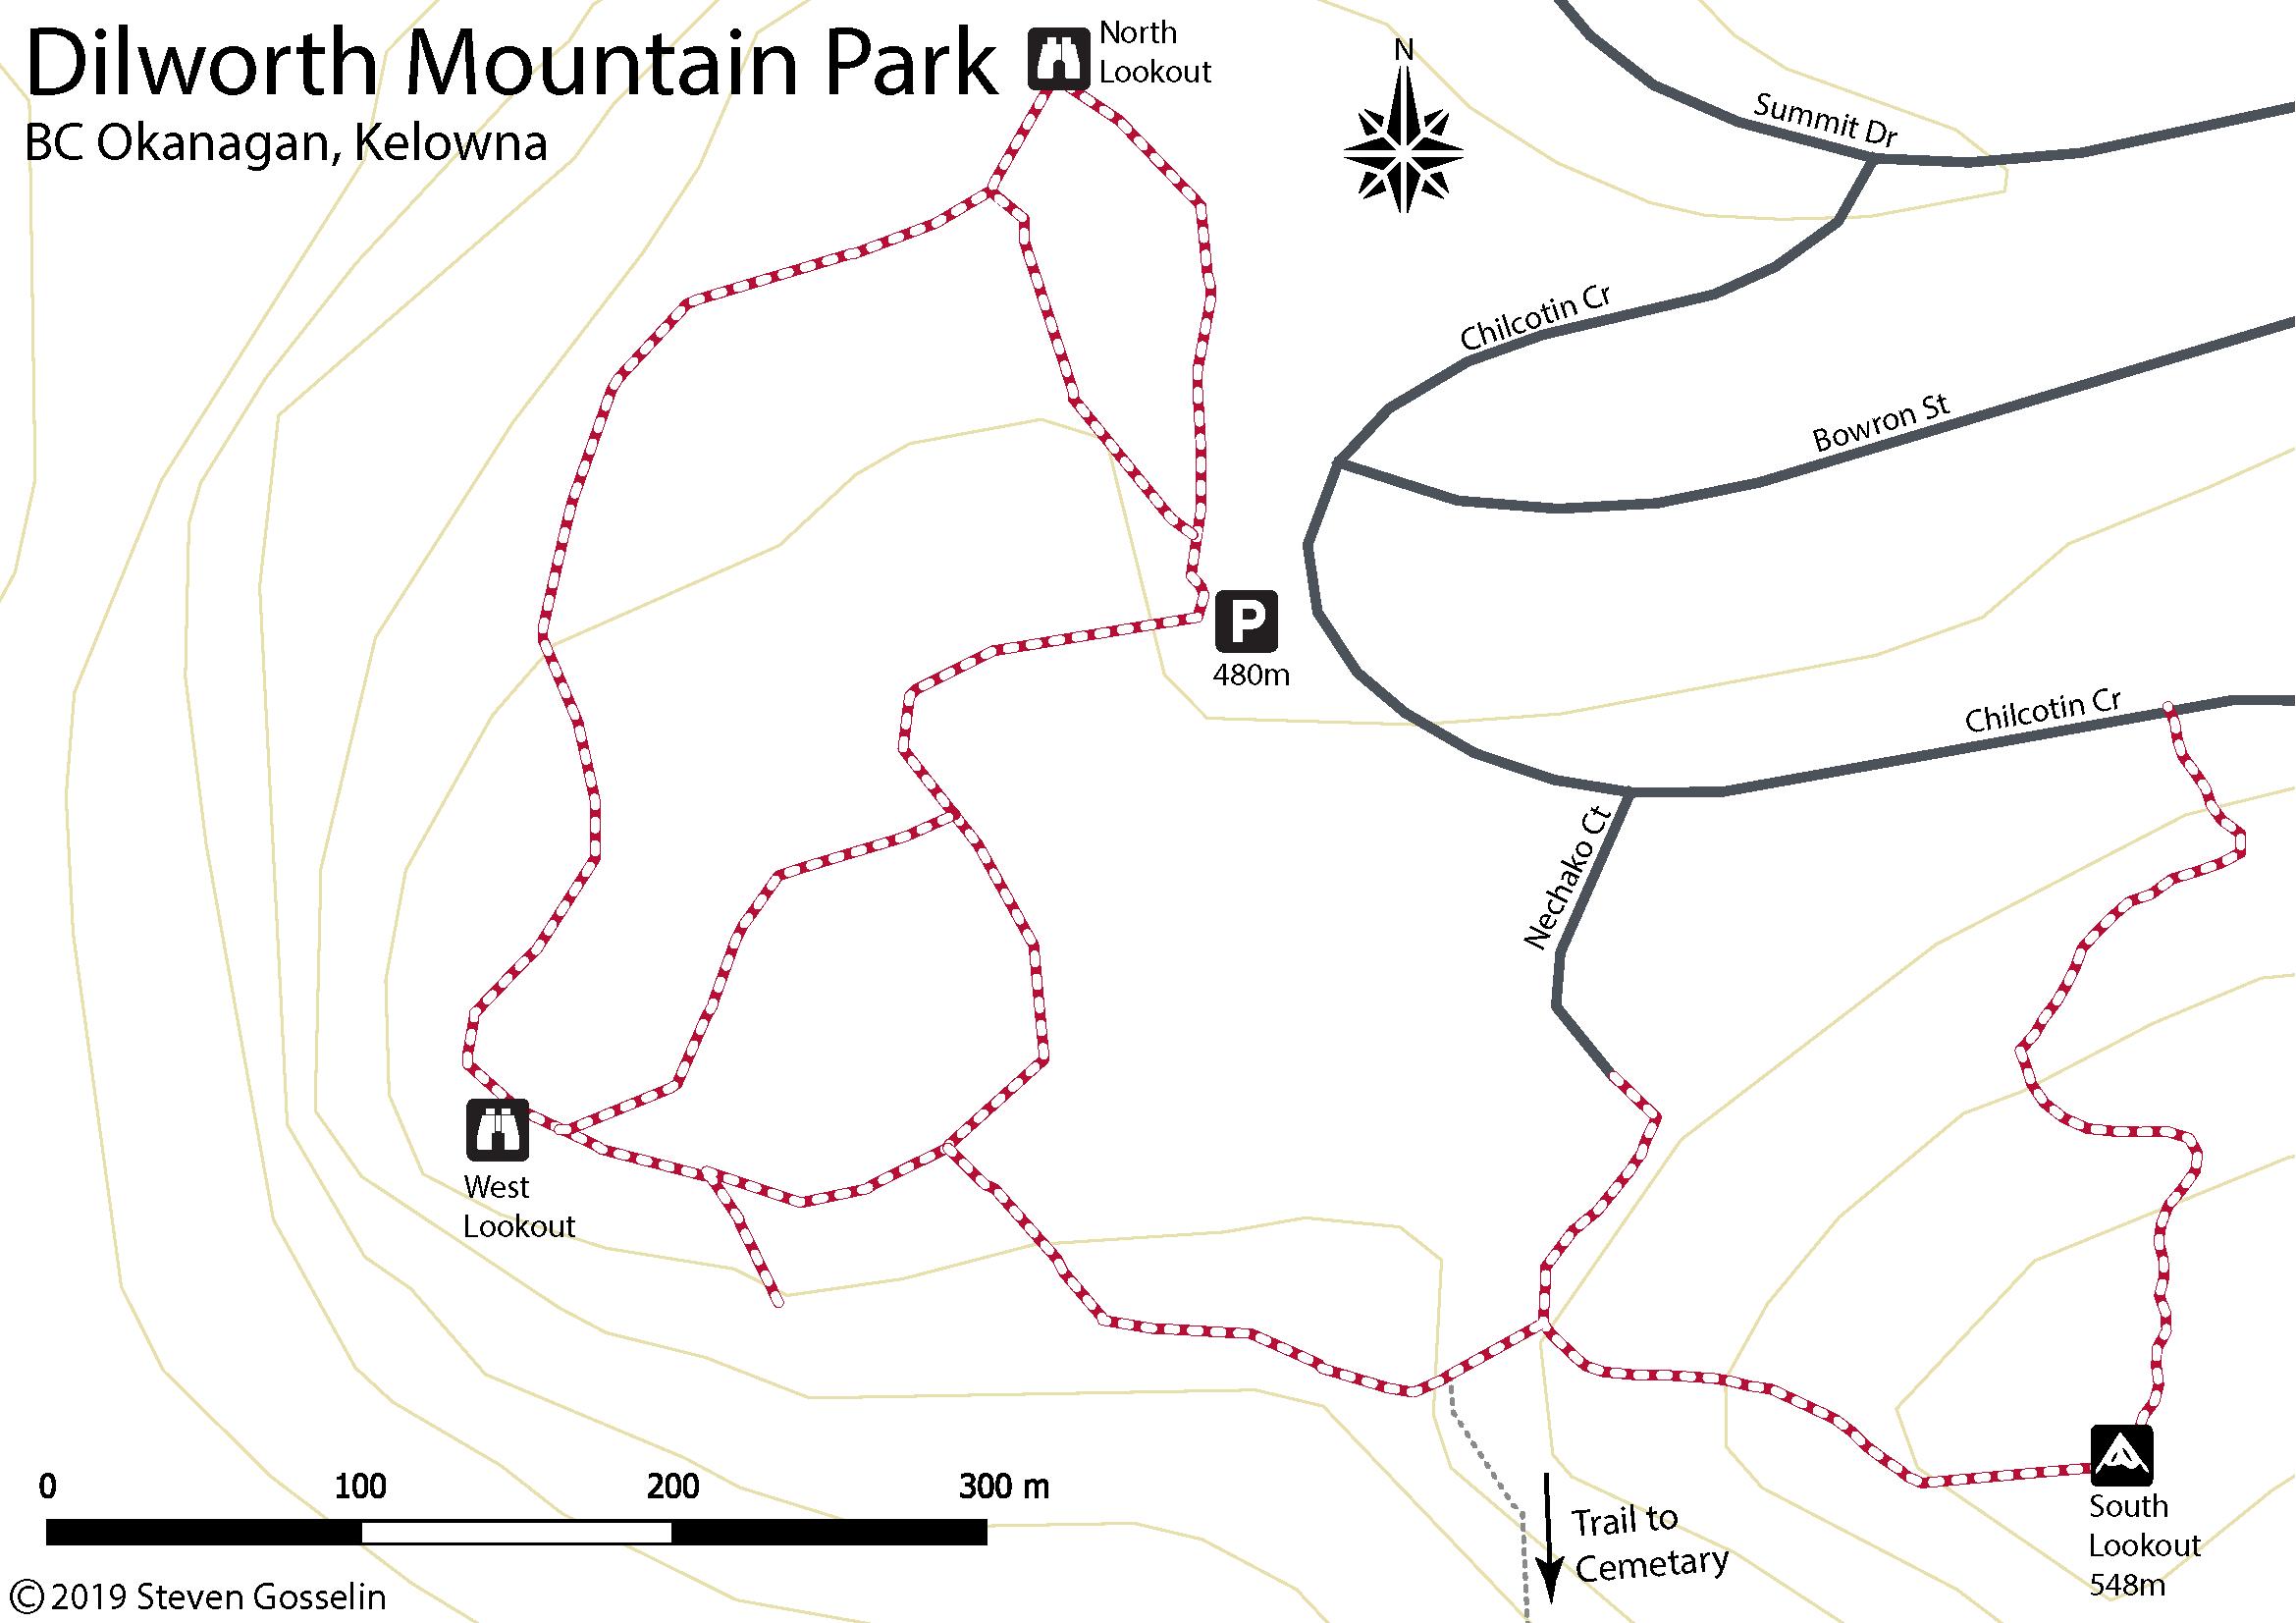 Dilworth Mountain Park